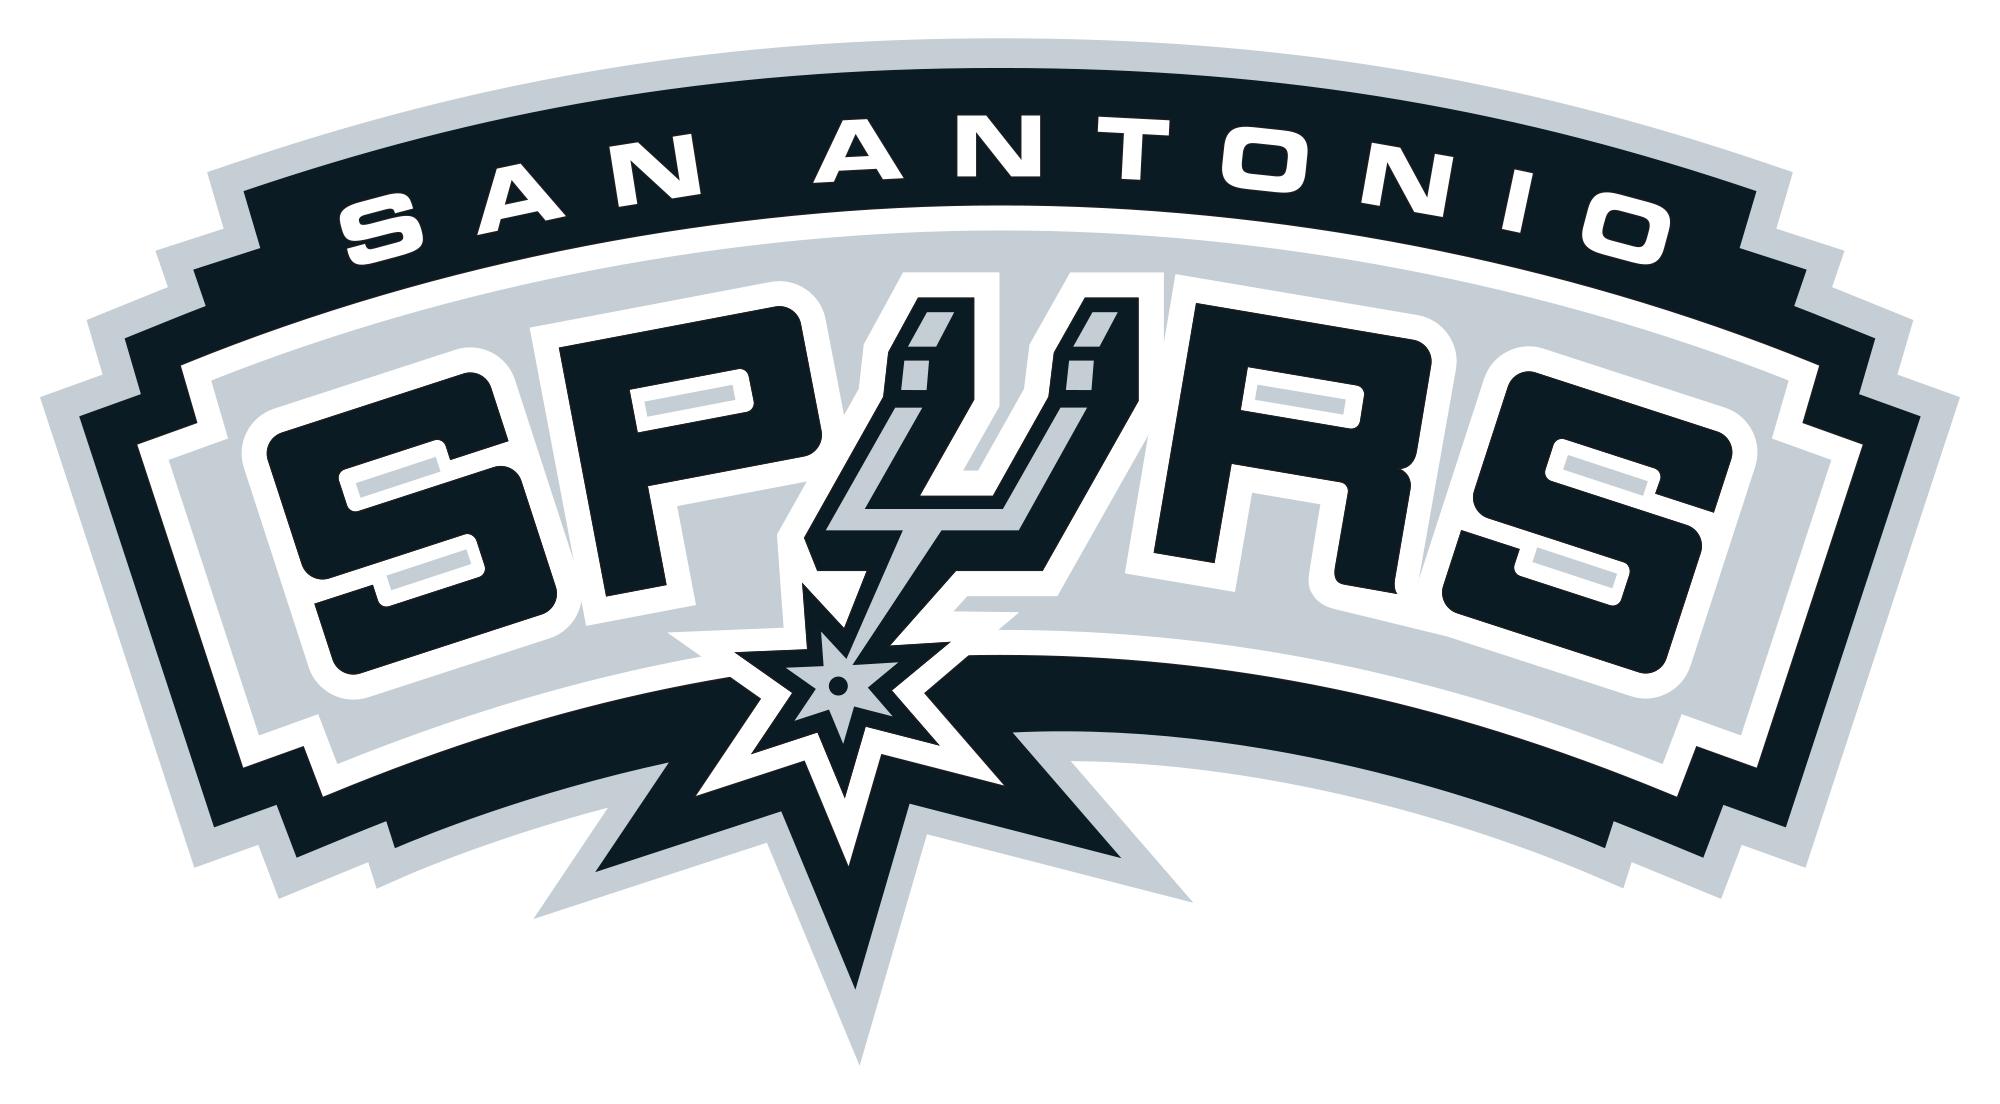 San Antonio Spurs Symbol wallpapers HD